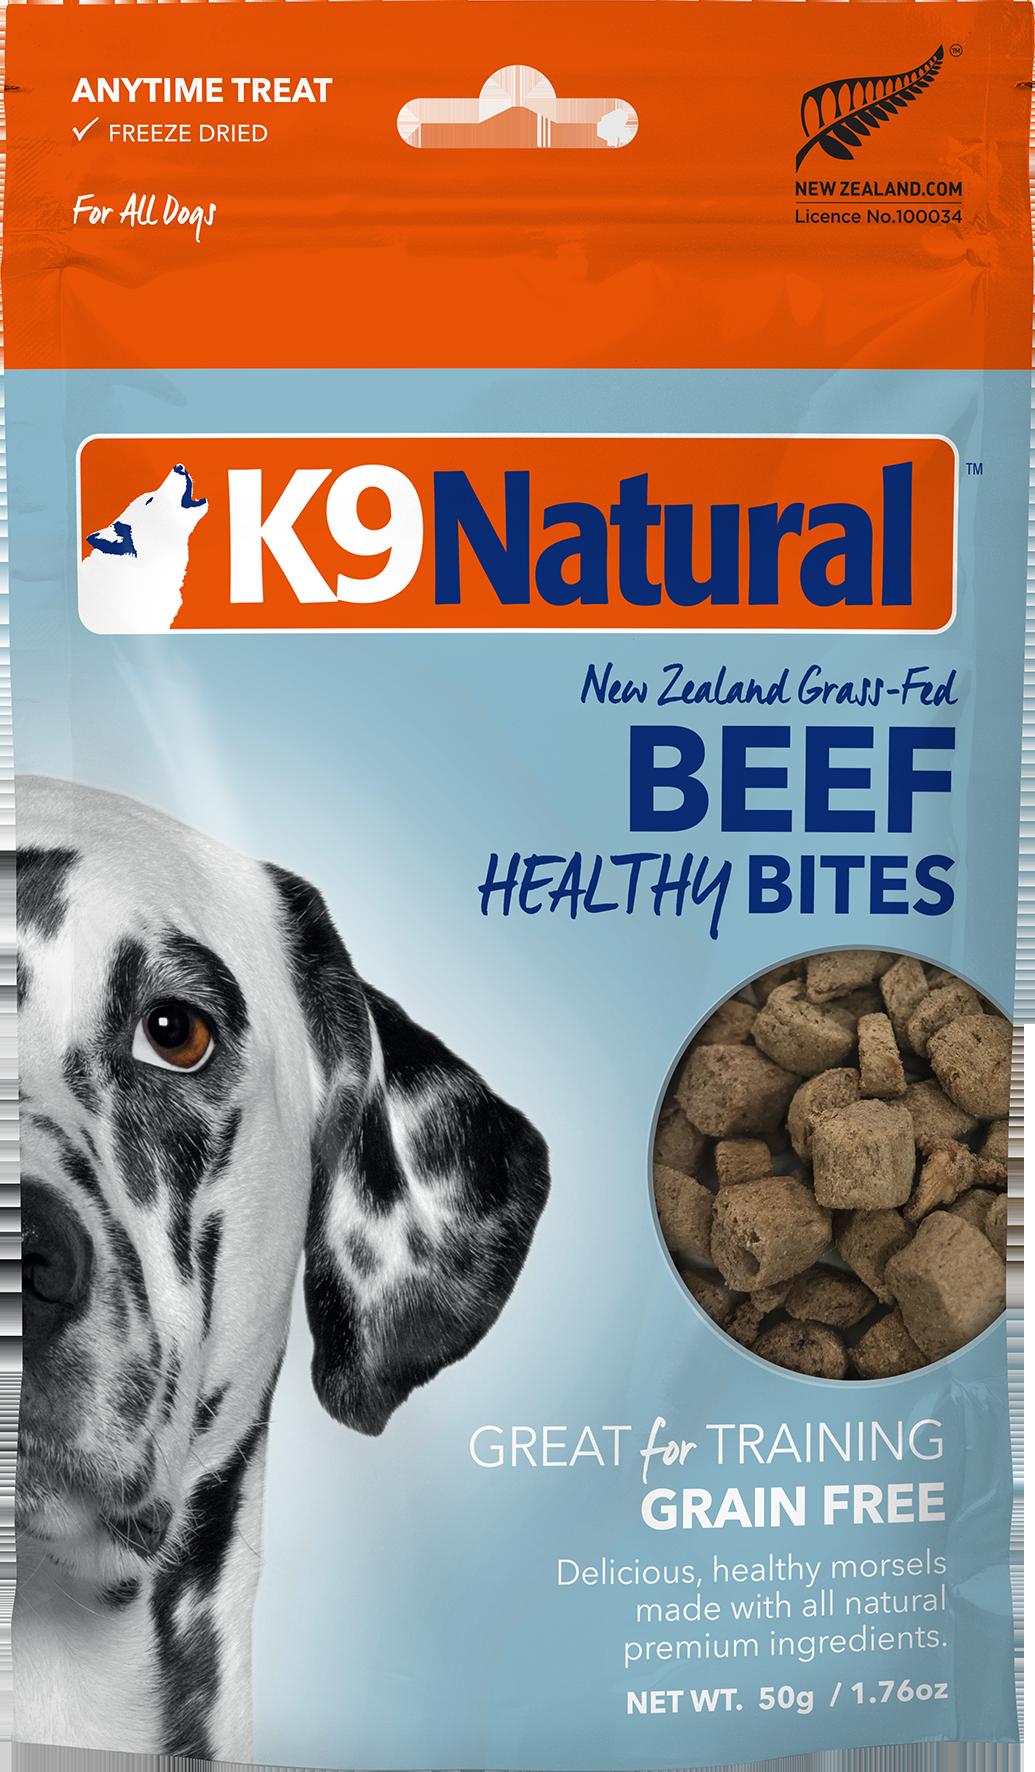 K9 Natural K9 Natural Freeze Dried Bites Beef Dog Treat 1.76oz